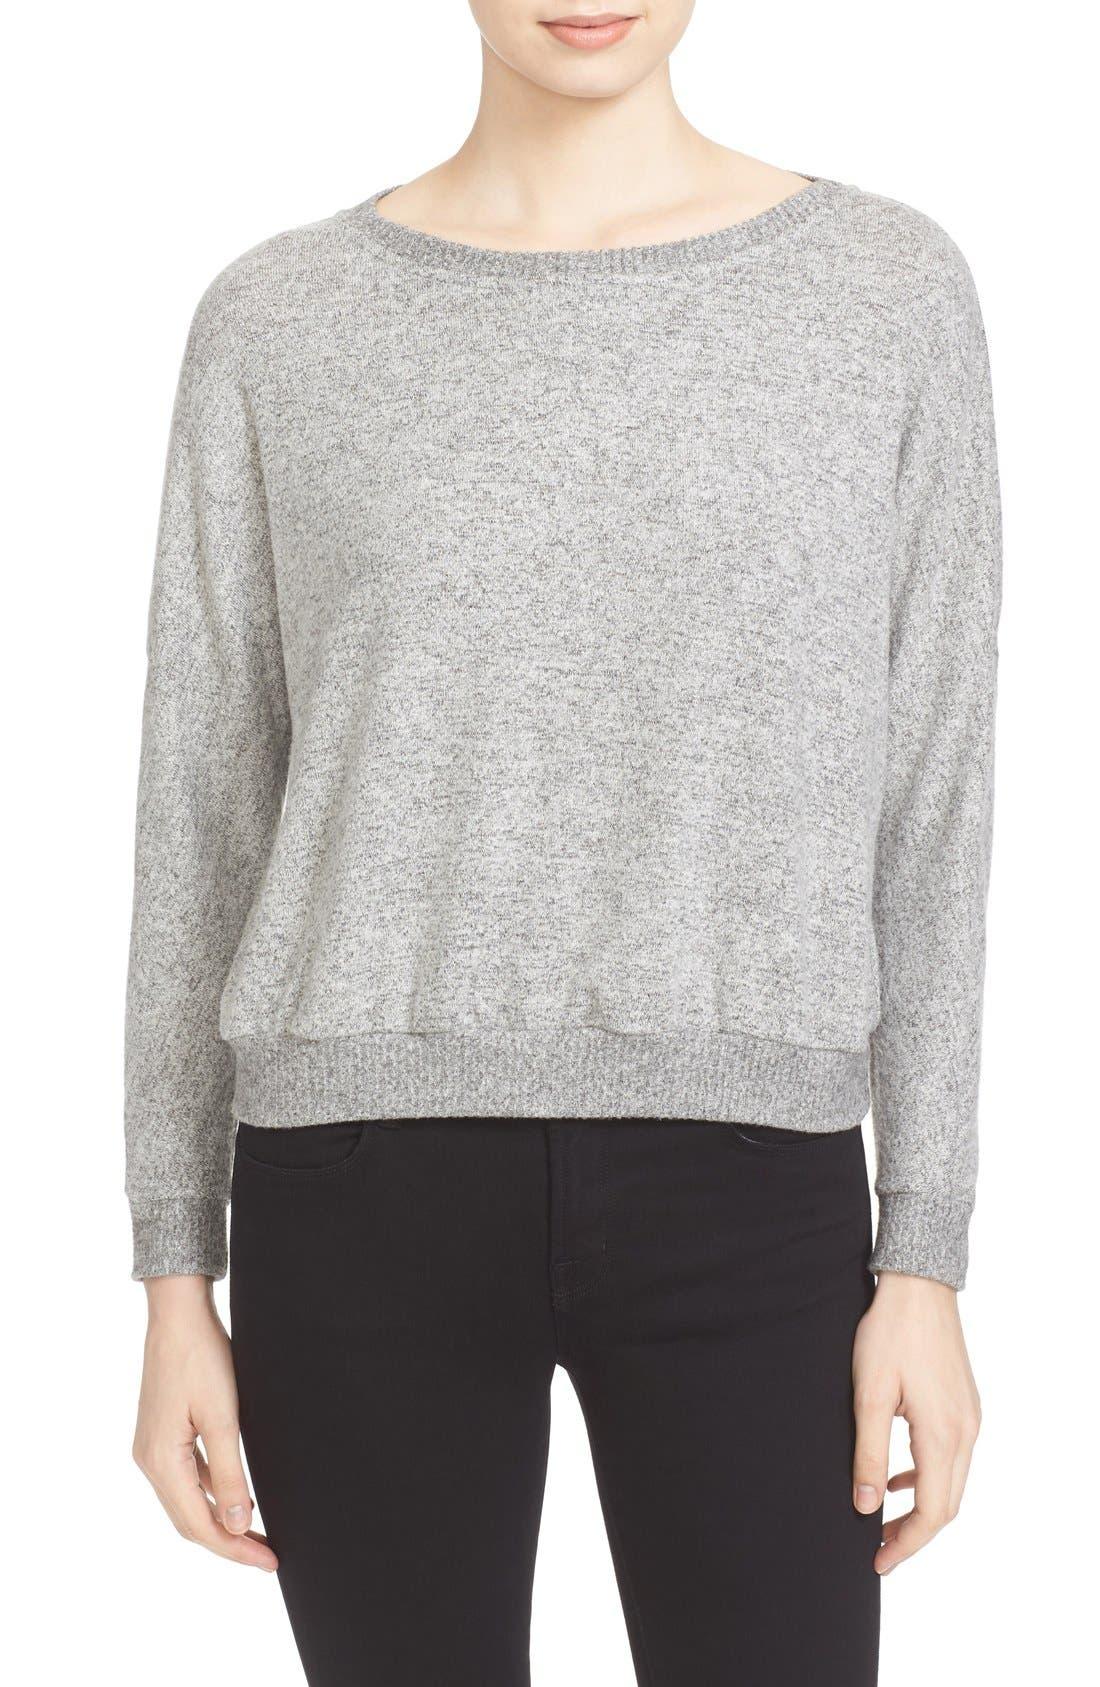 Soft Joie Giardia Drop Shoulder Sweater,                             Main thumbnail 1, color,